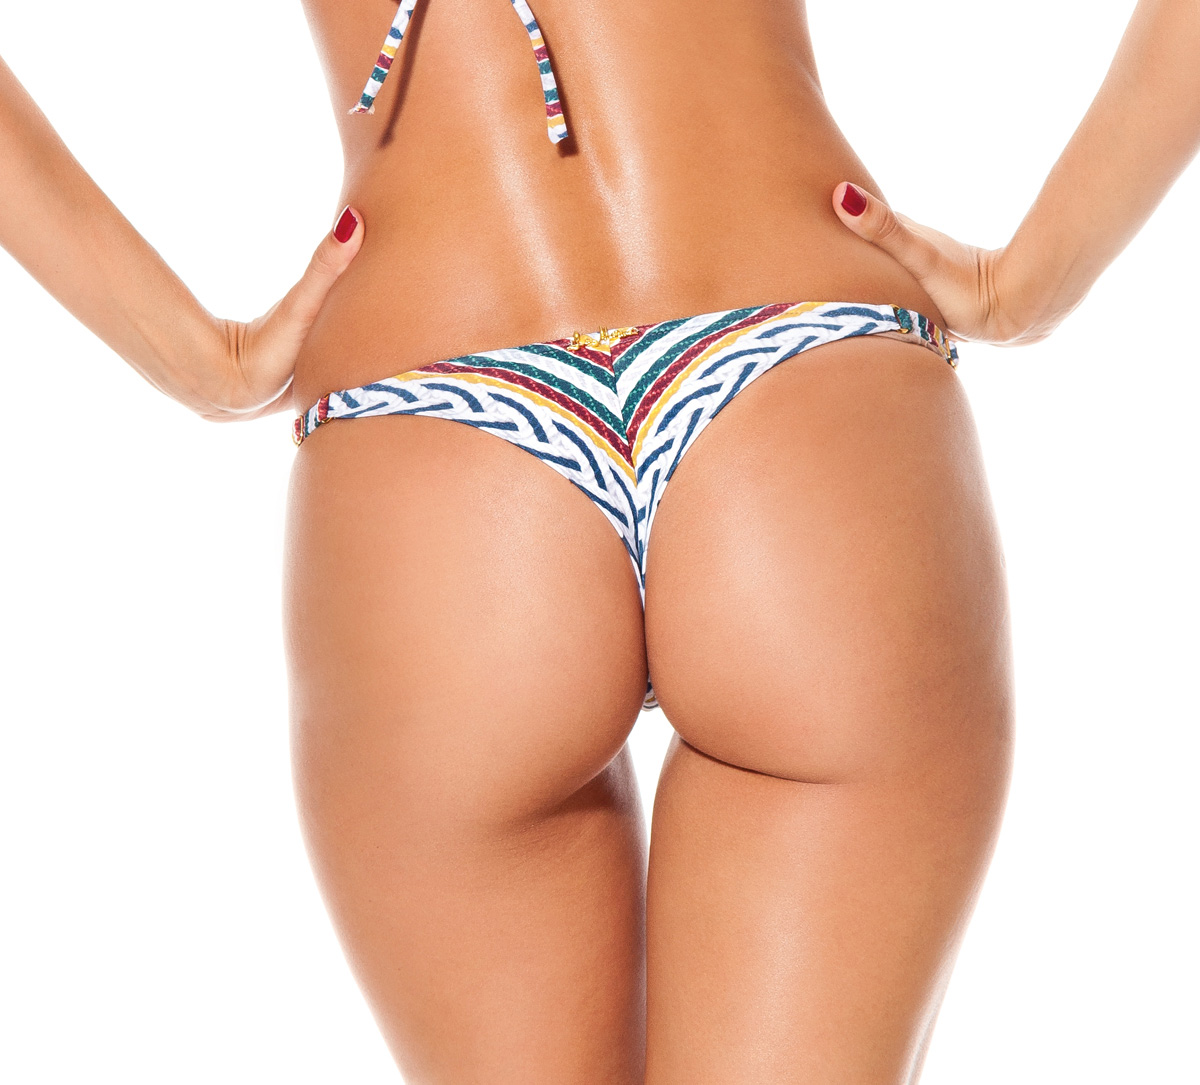 Bikini thong bottoms can